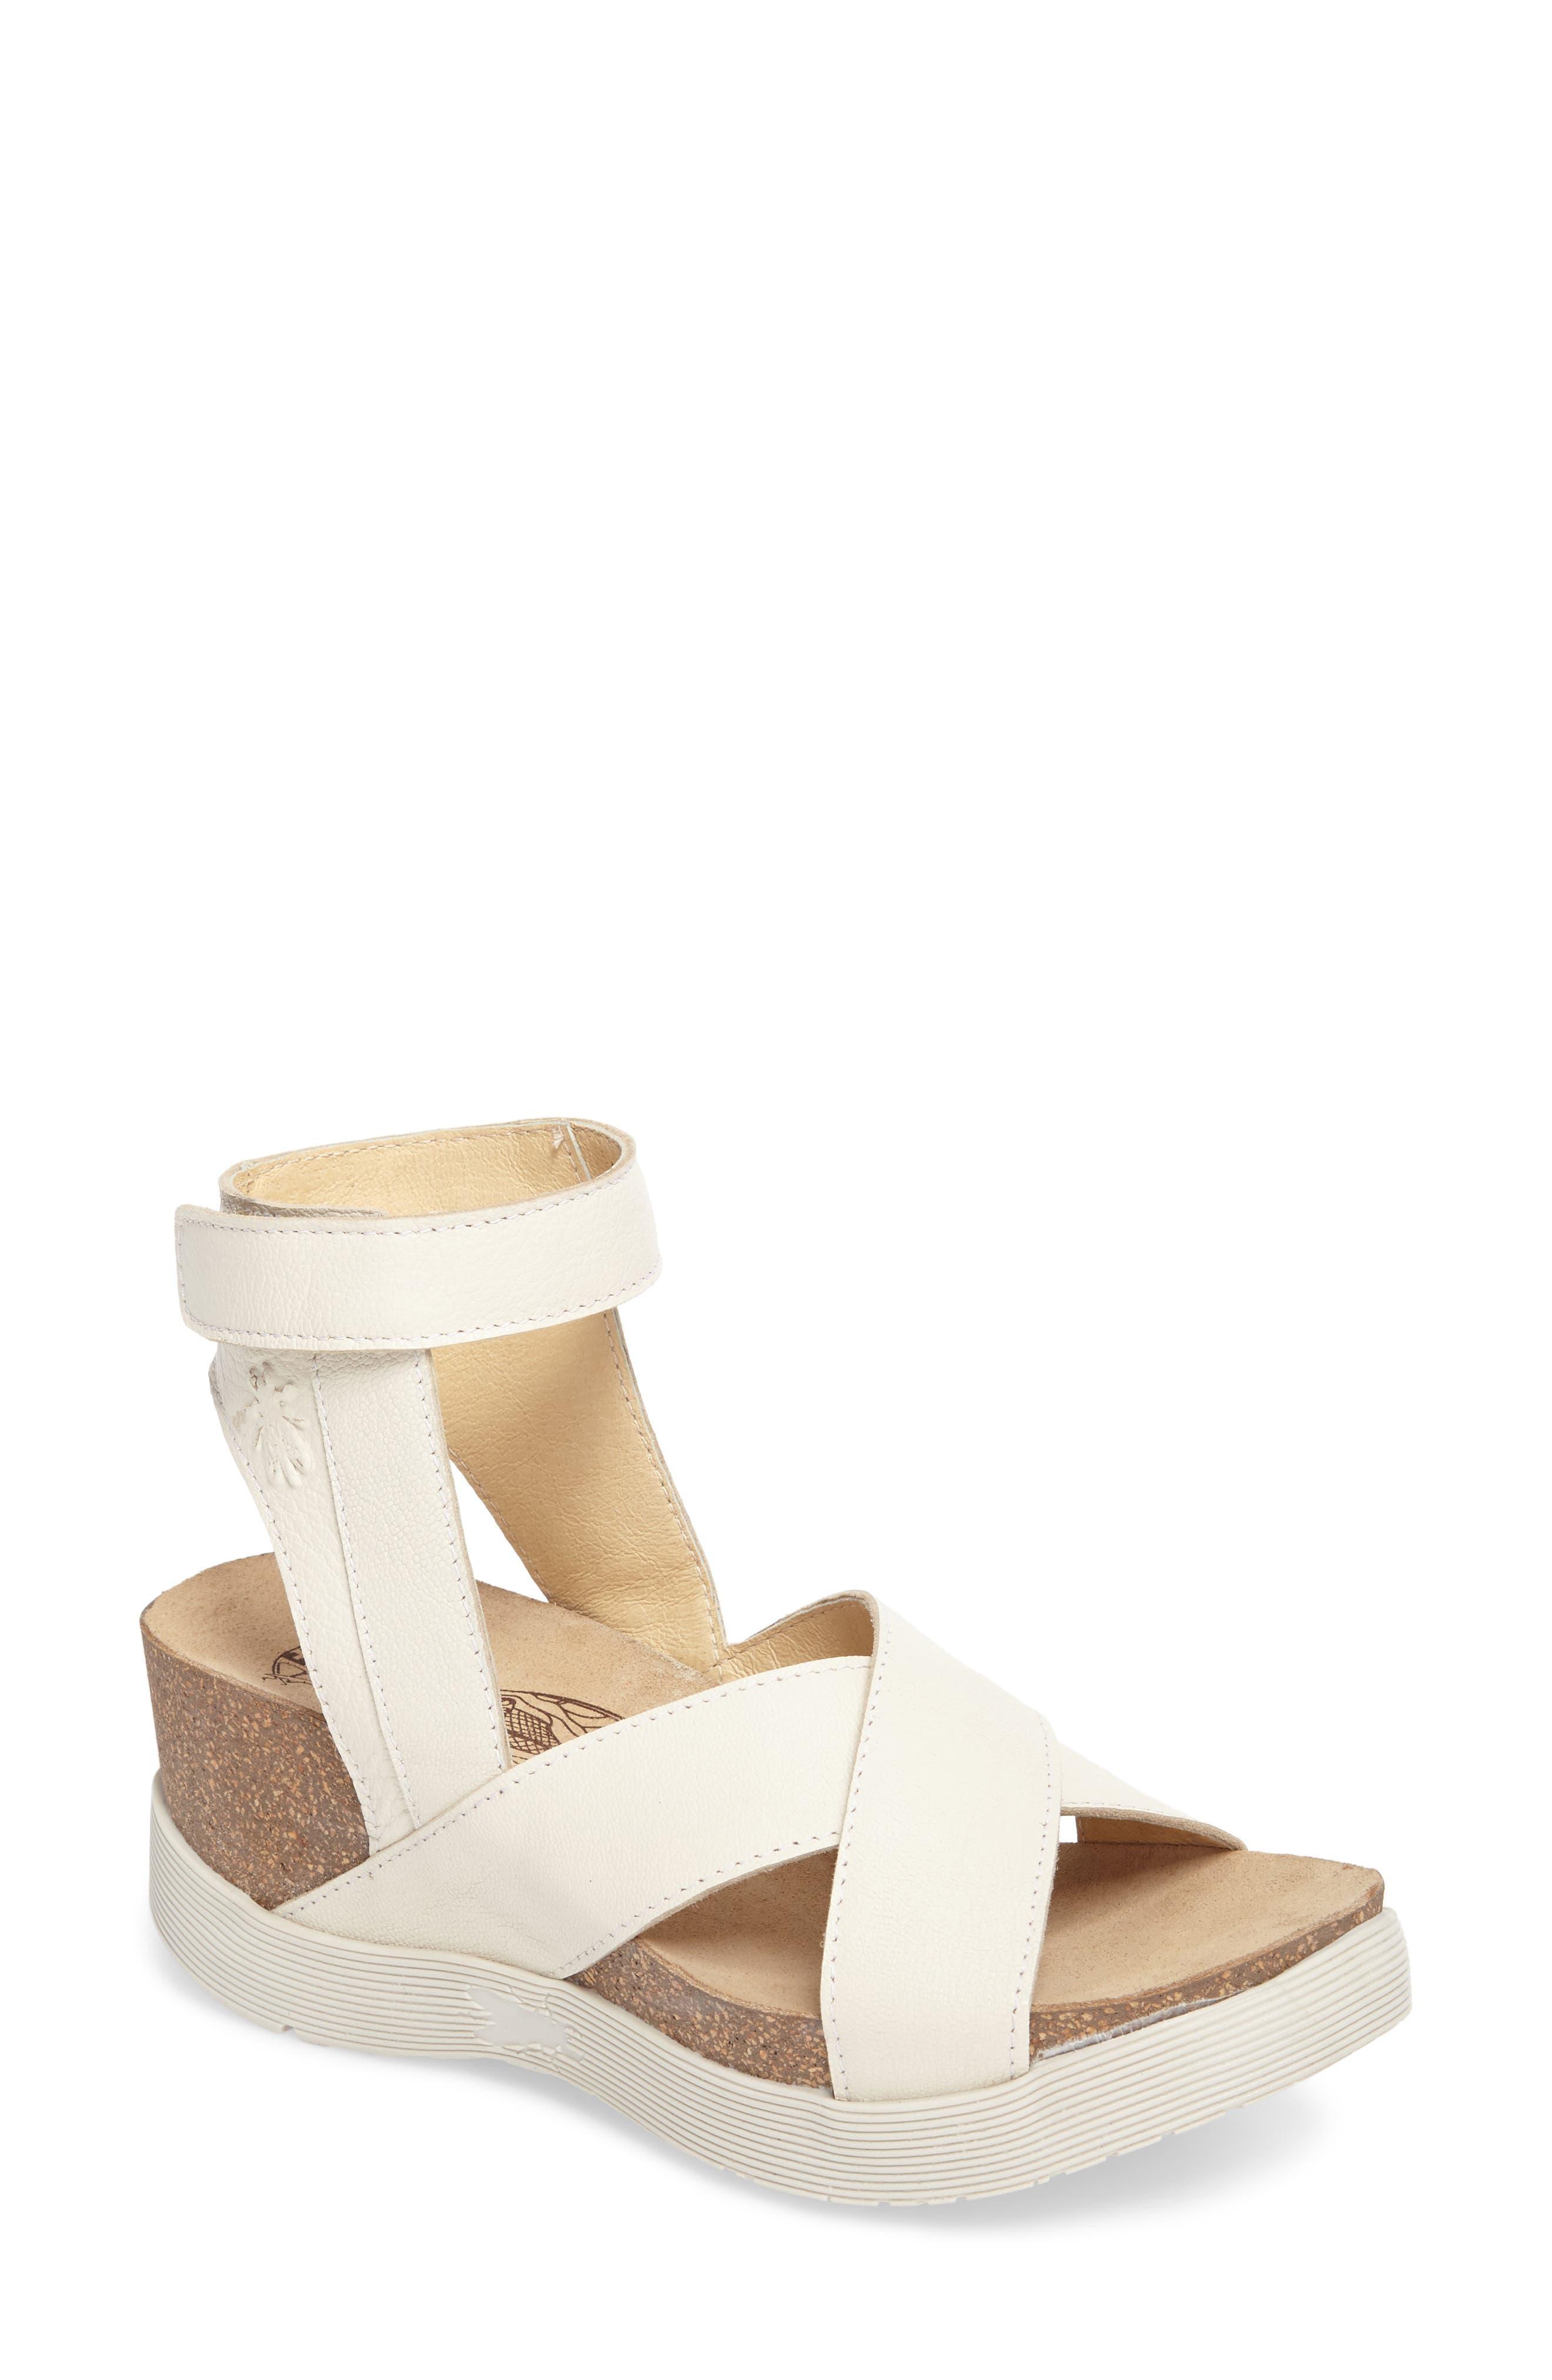 Alternate Image 1 Selected - Fly London Weel Nubuck Leather Platform Sandal (Women)